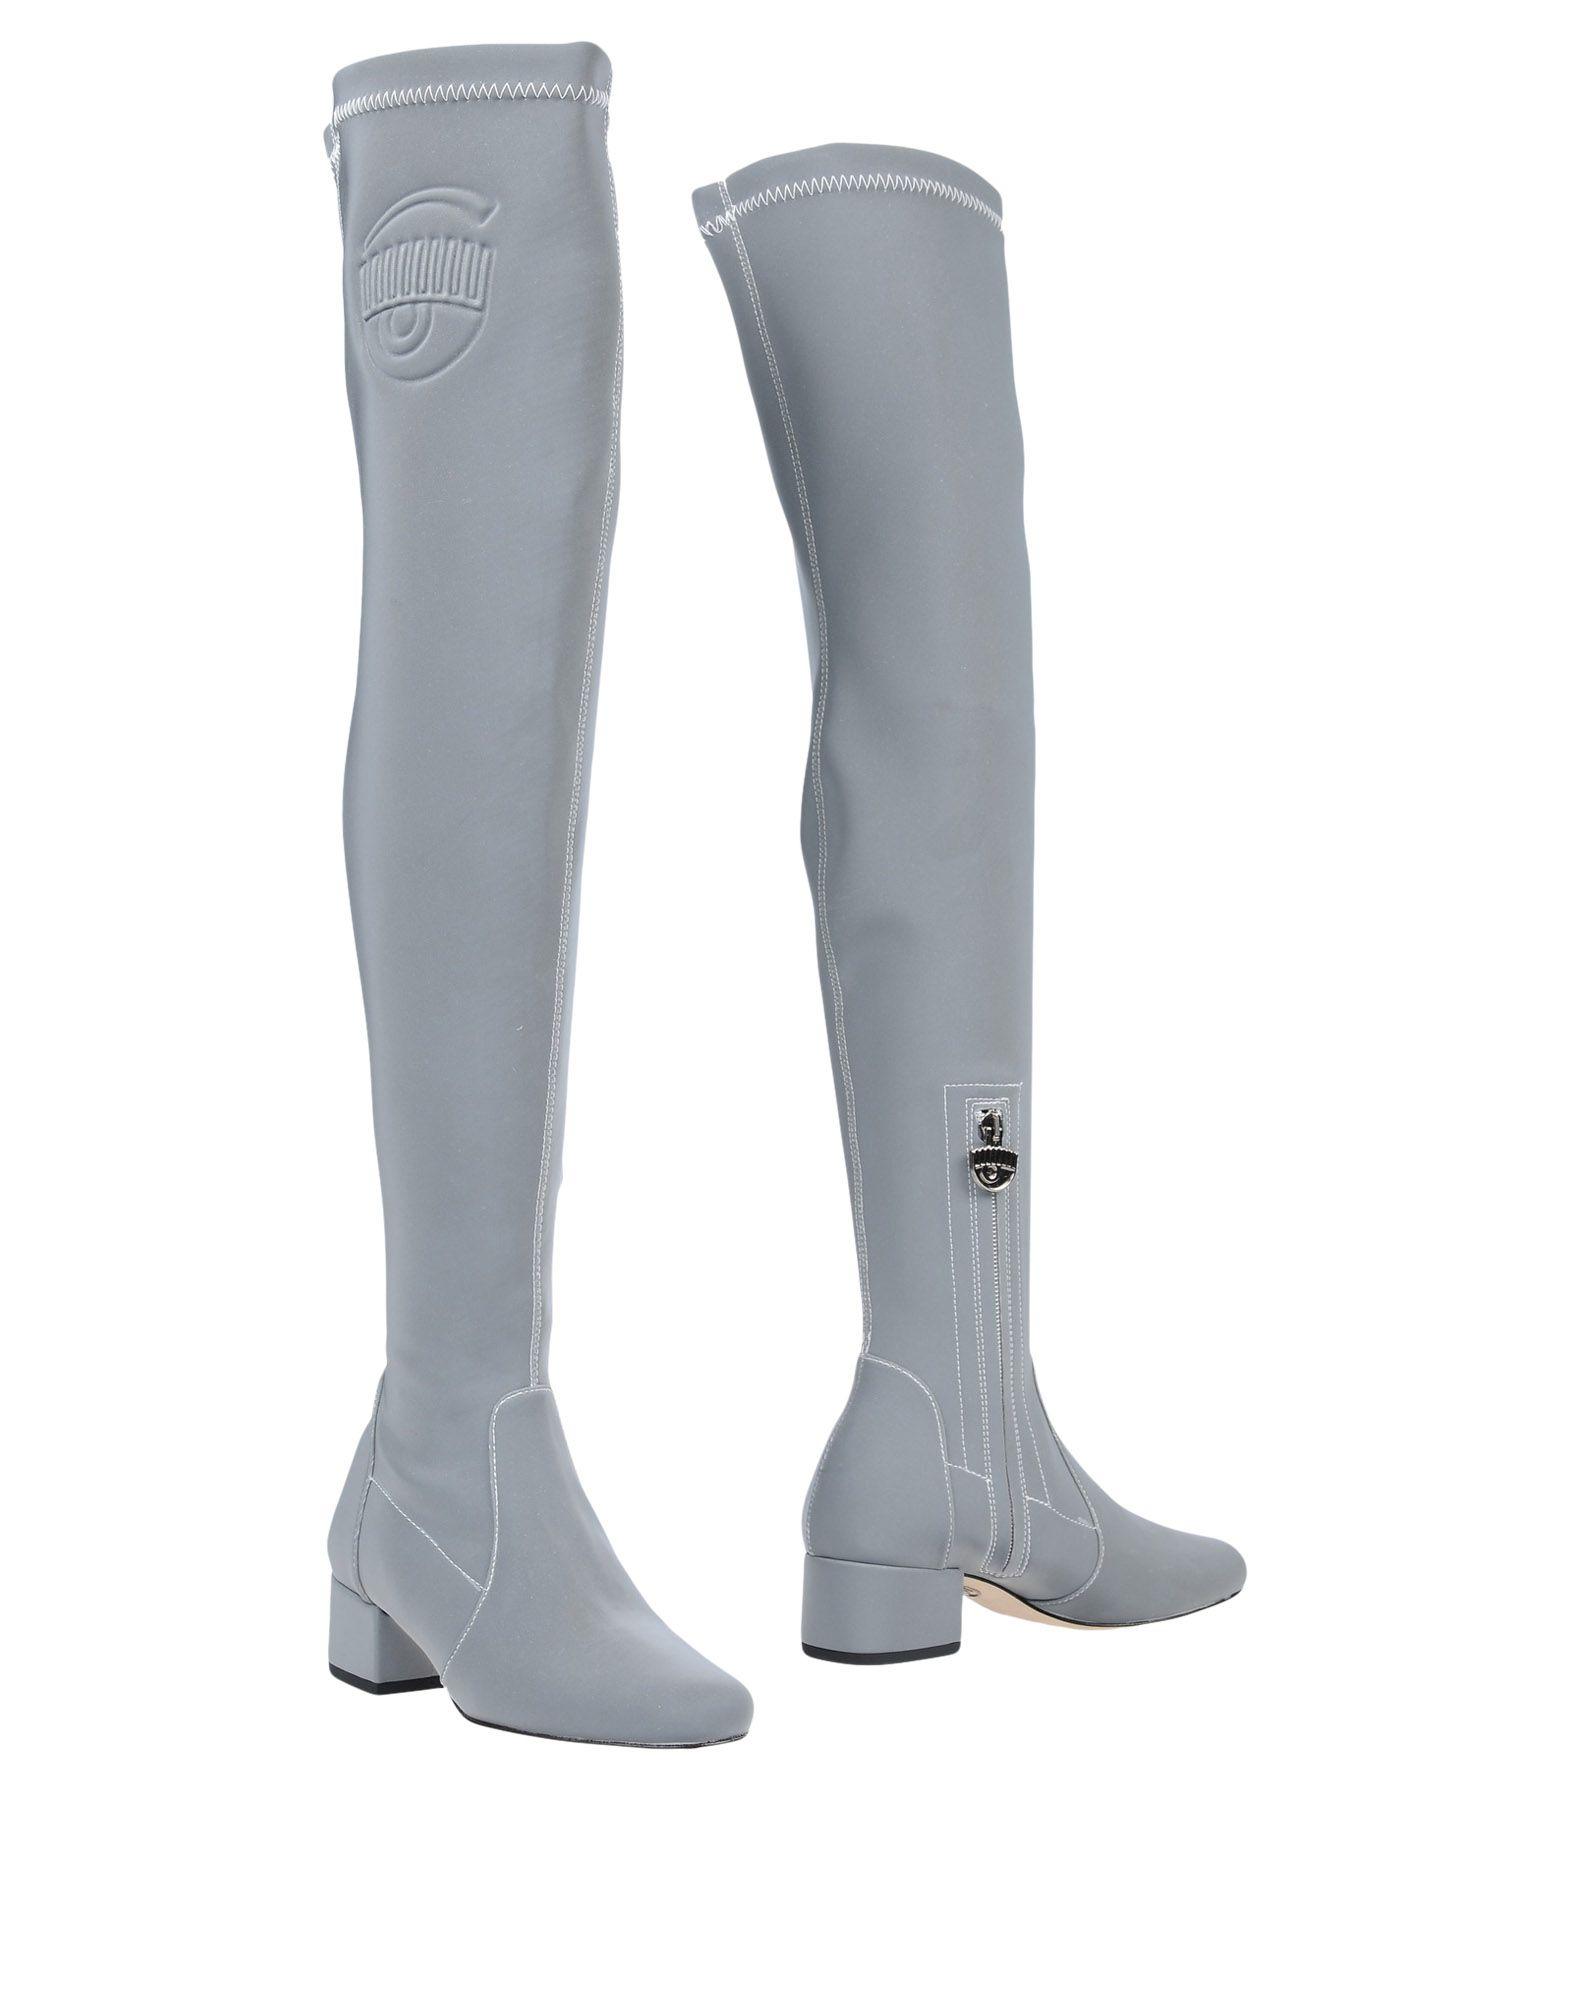 Chiara Ferragni Stiefel Damen Schuhe  11493227LEGünstige gut aussehende Schuhe Damen 82314d